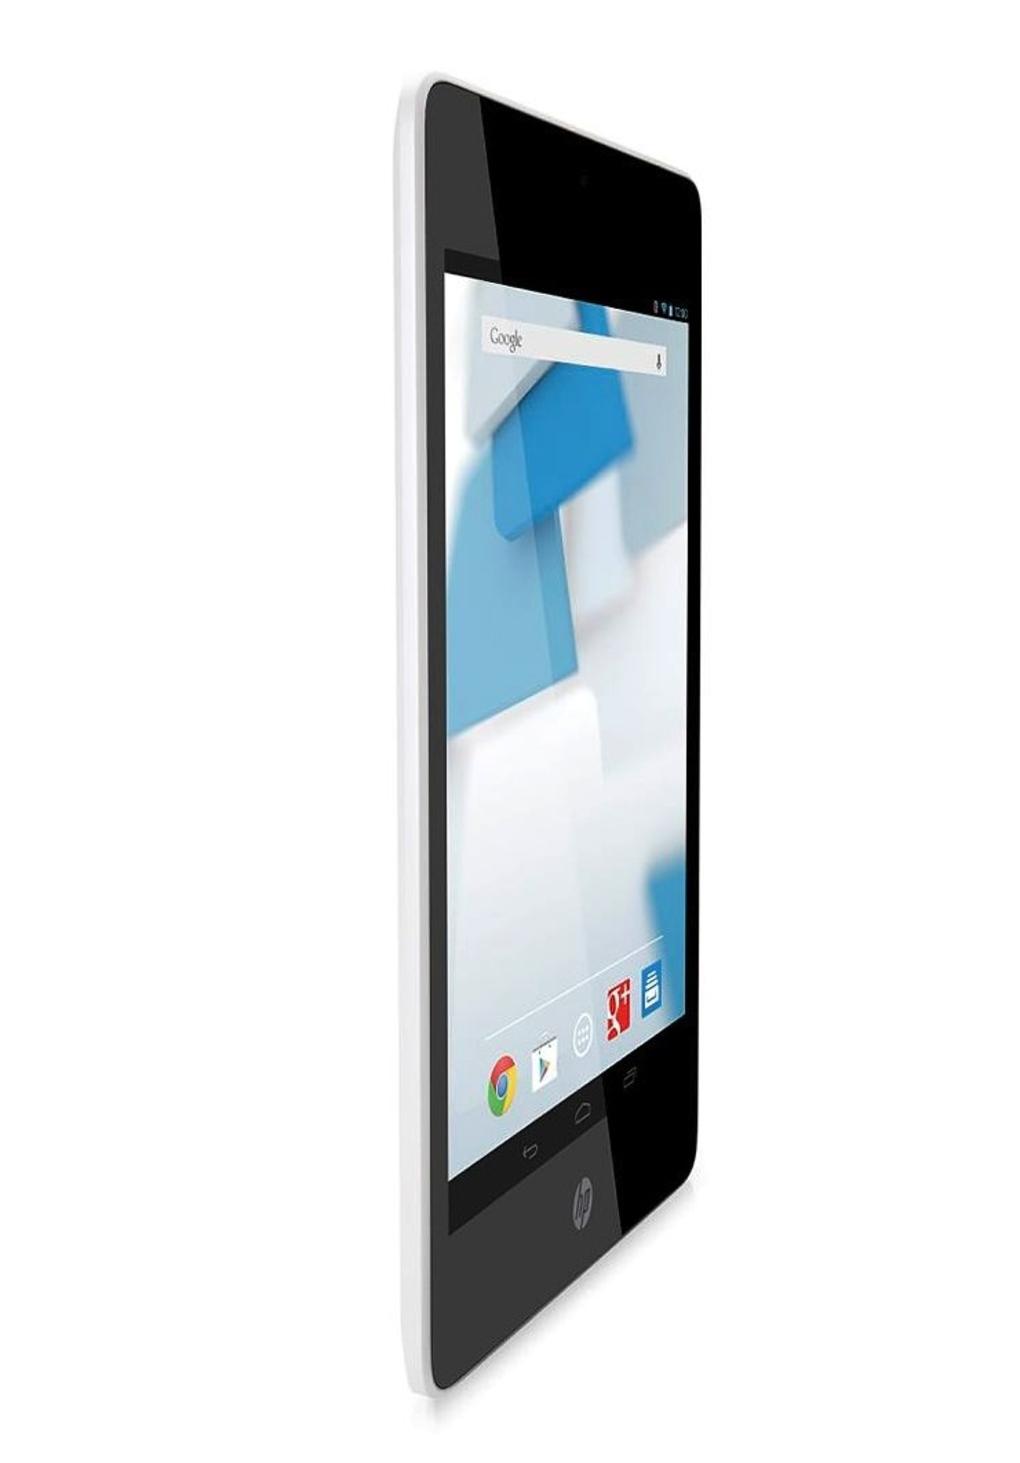 HP Slate 8 Plus - 8-calowy tablet z modemem 3G za 299 euro